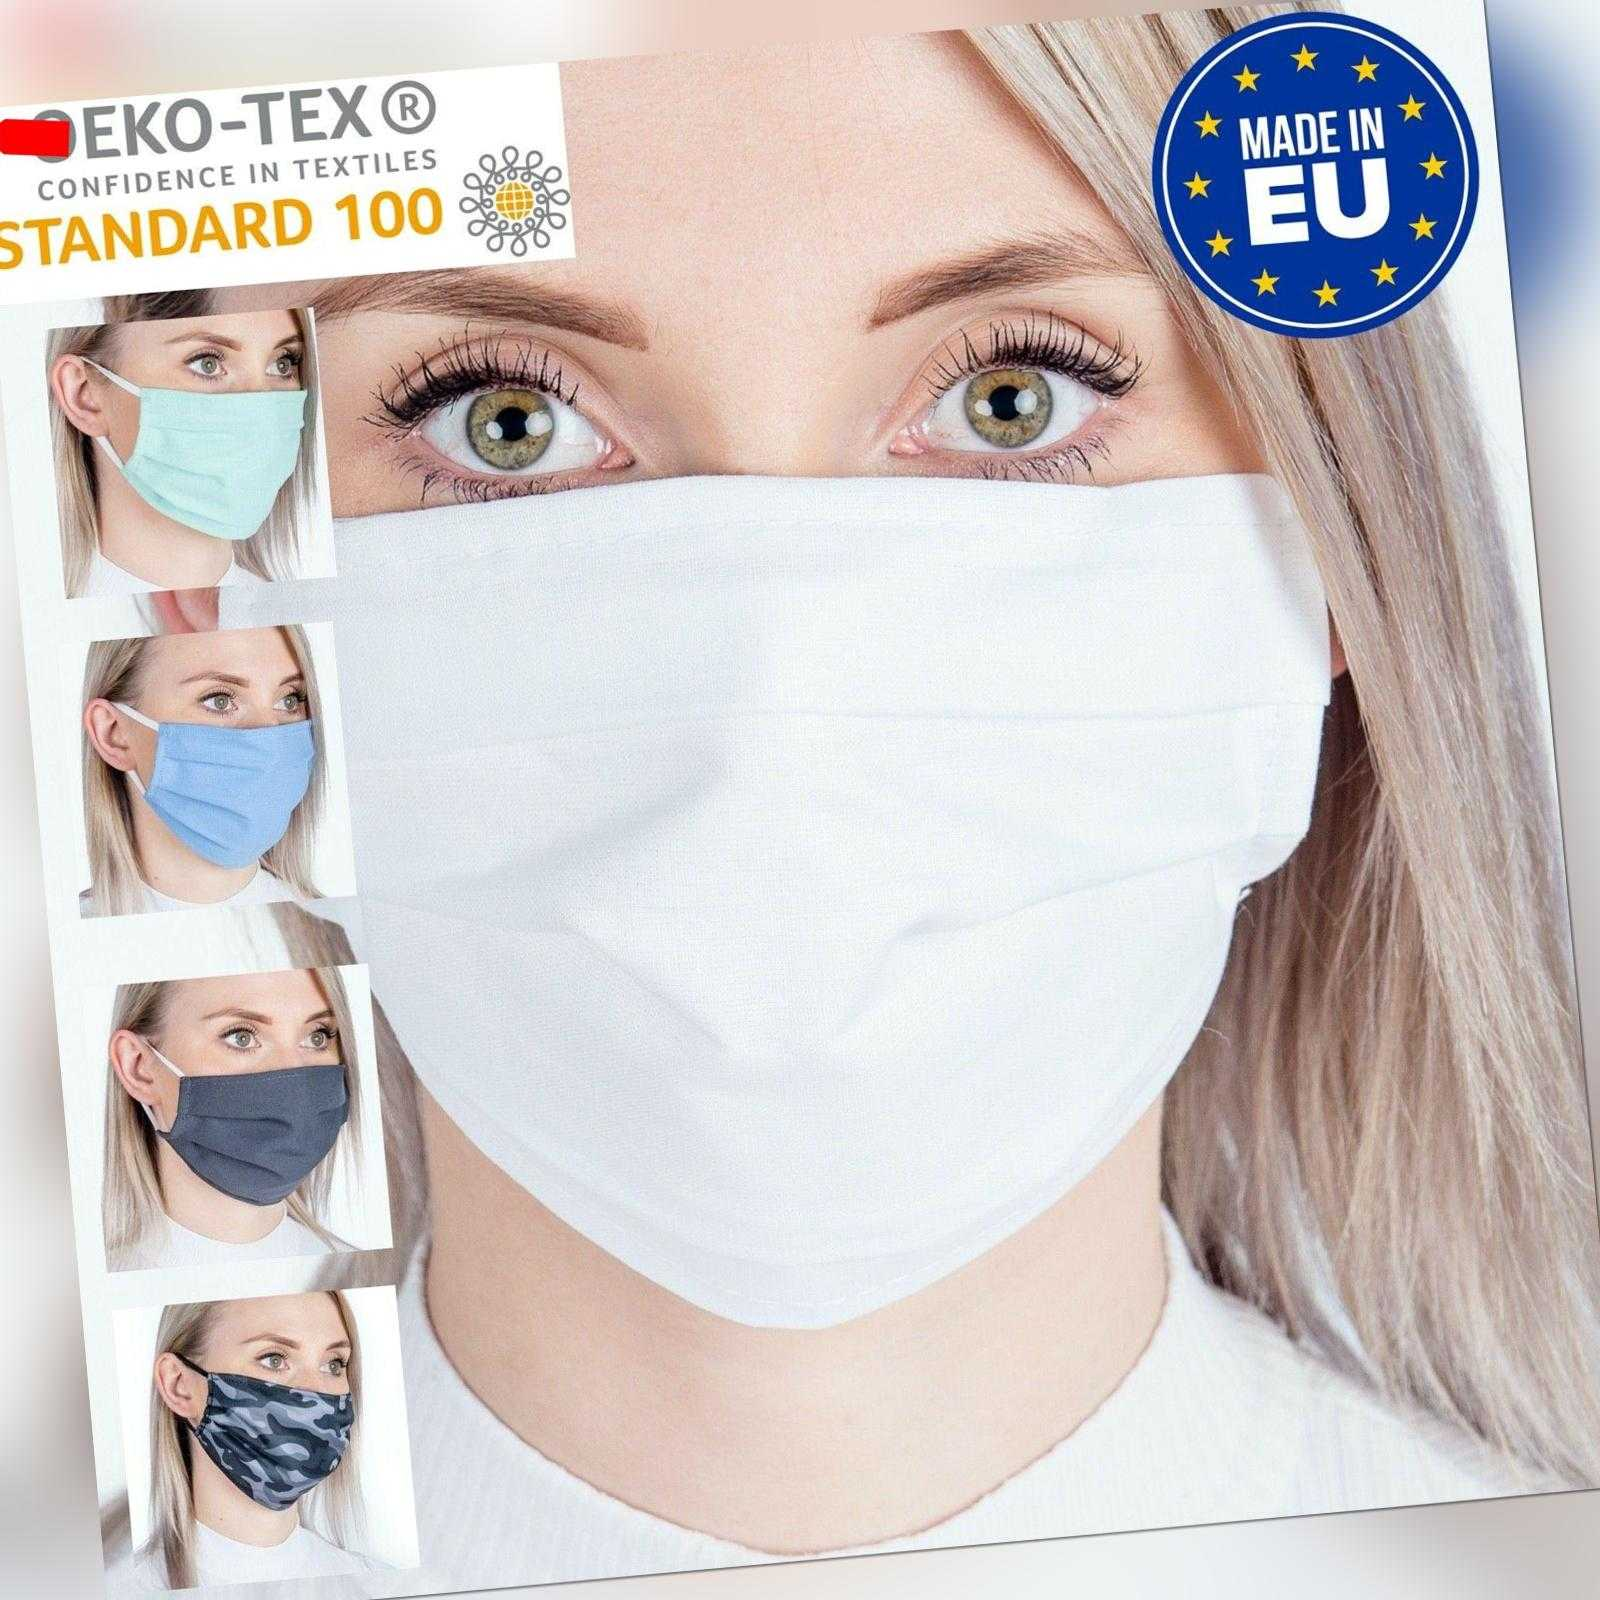 Mundmaske waschbar Stoffmaske Gesichtmaske Nasenmaske Mundbedeckung Baumwolle